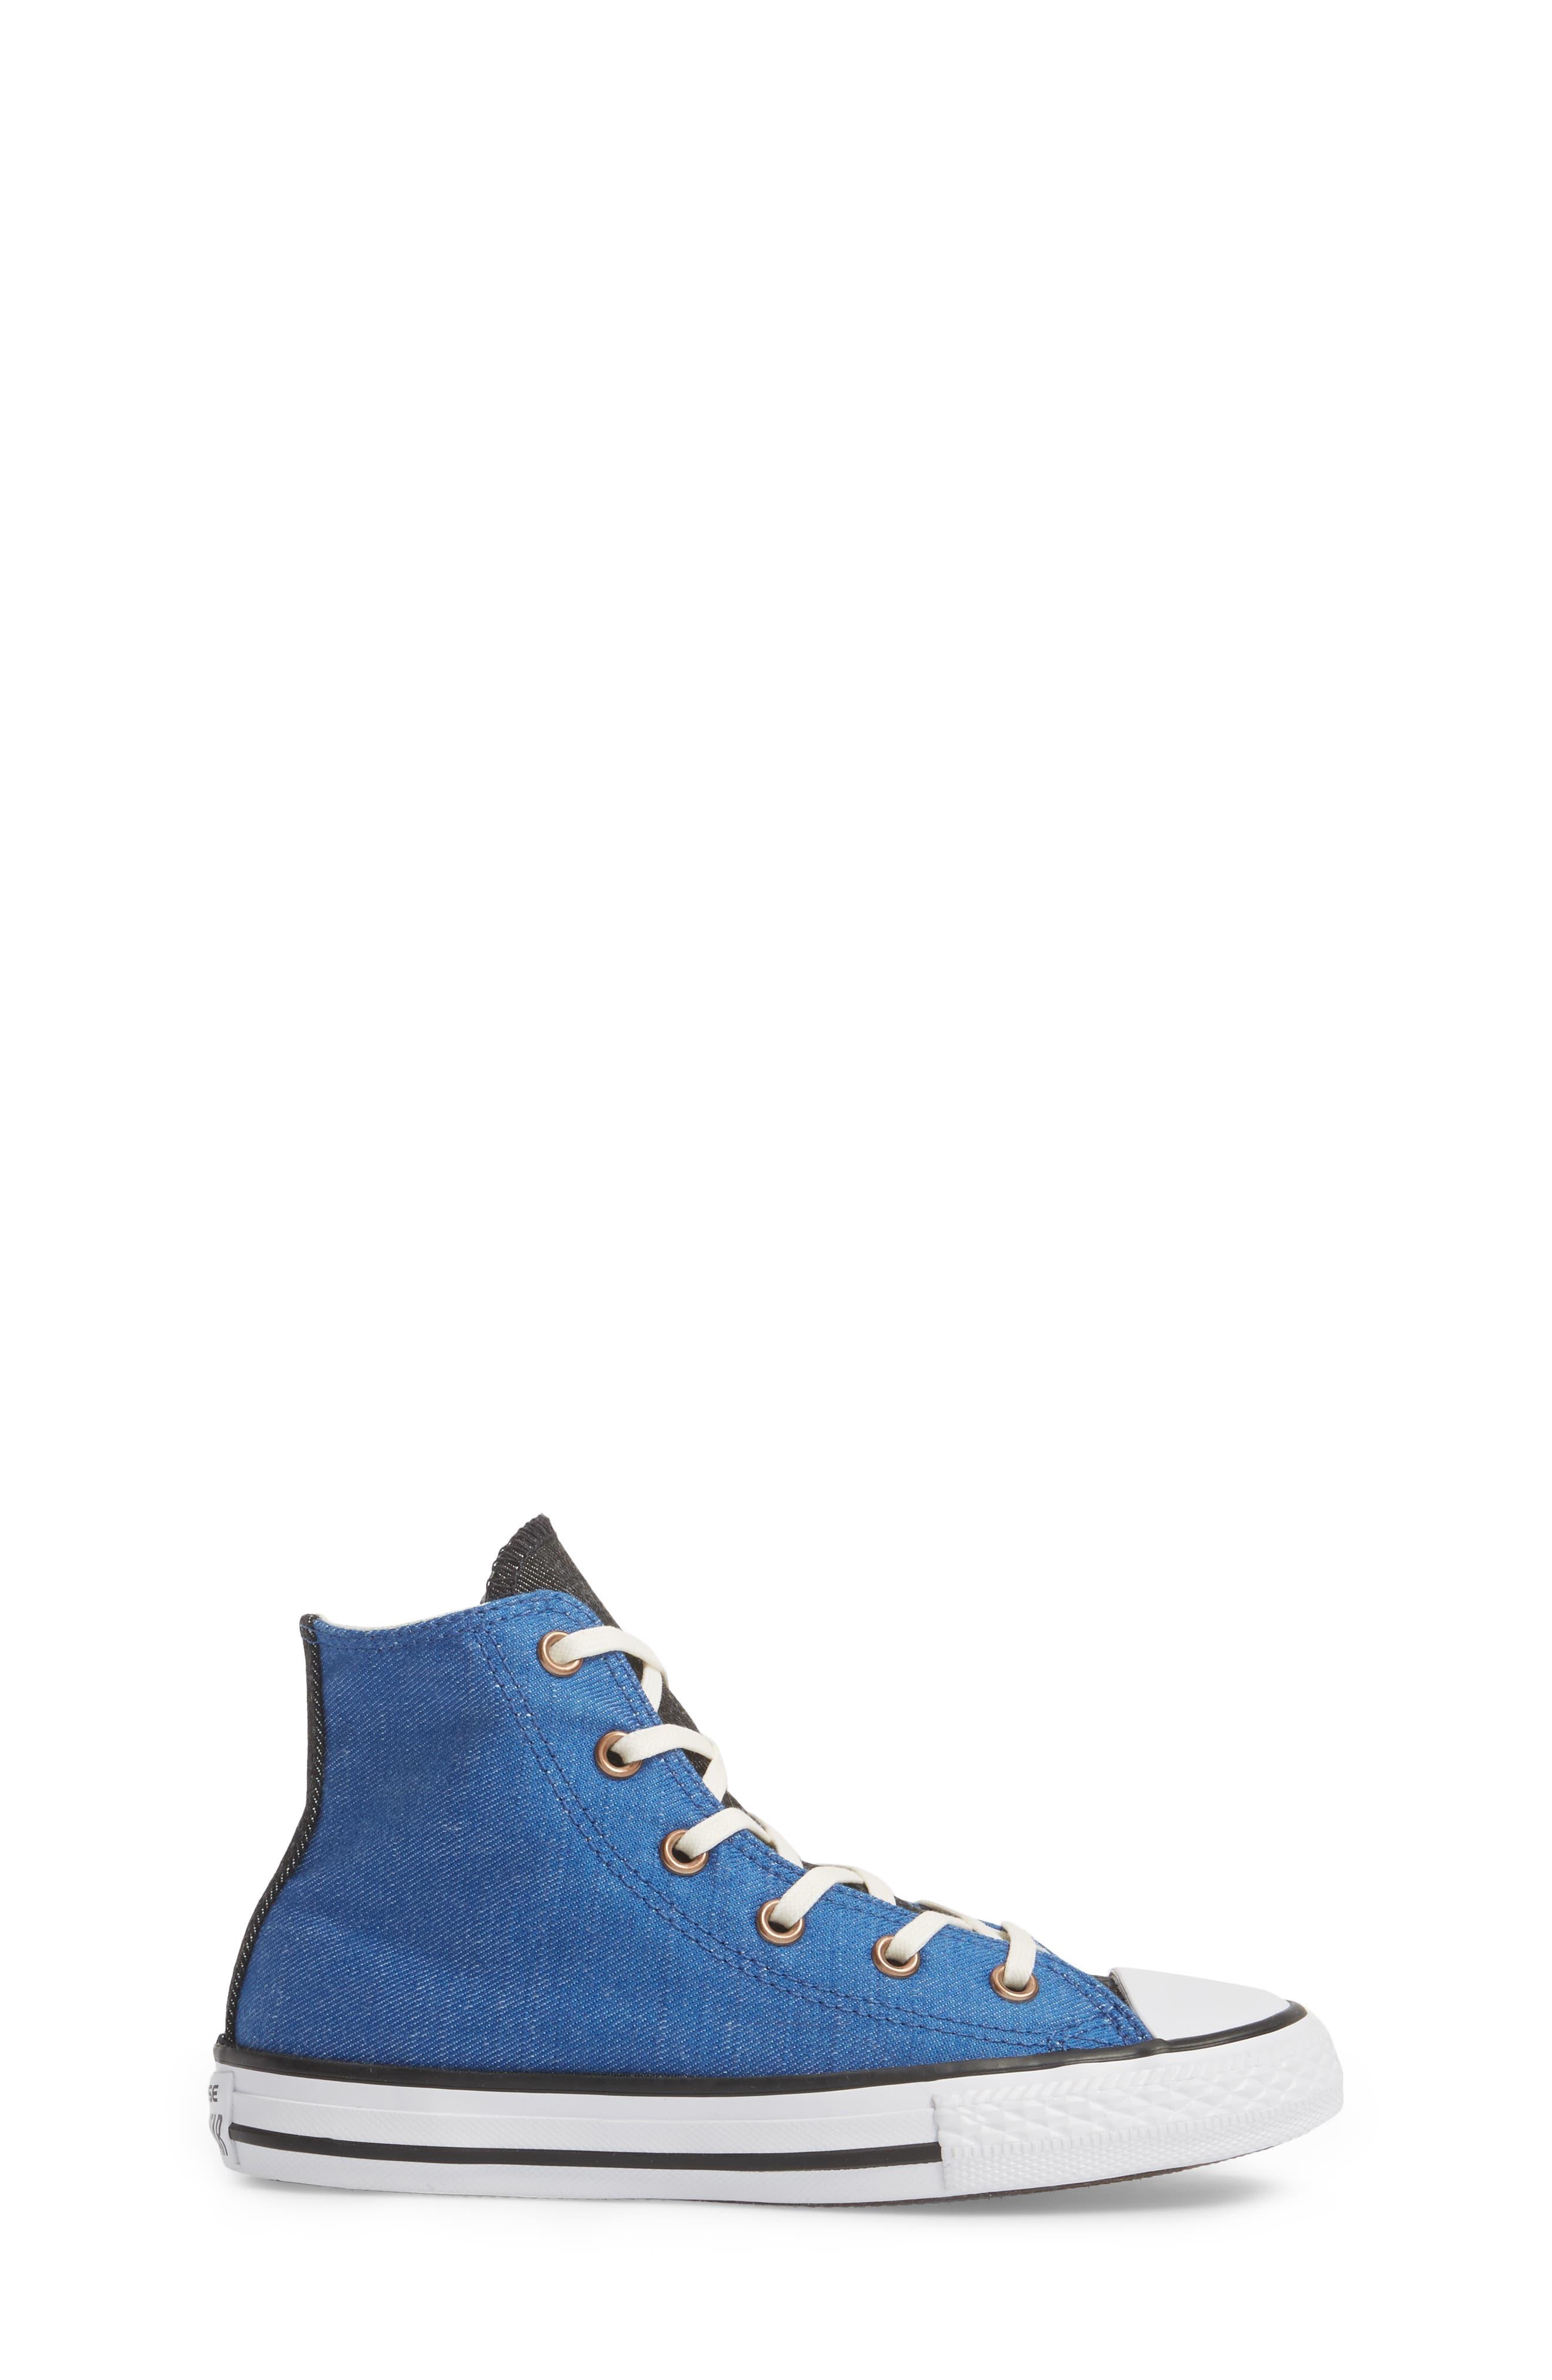 Chuck Taylor<sup>®</sup> All Star<sup>®</sup> Chambray High Top Sneaker,                             Alternate thumbnail 3, color,                             Nightfall Blue